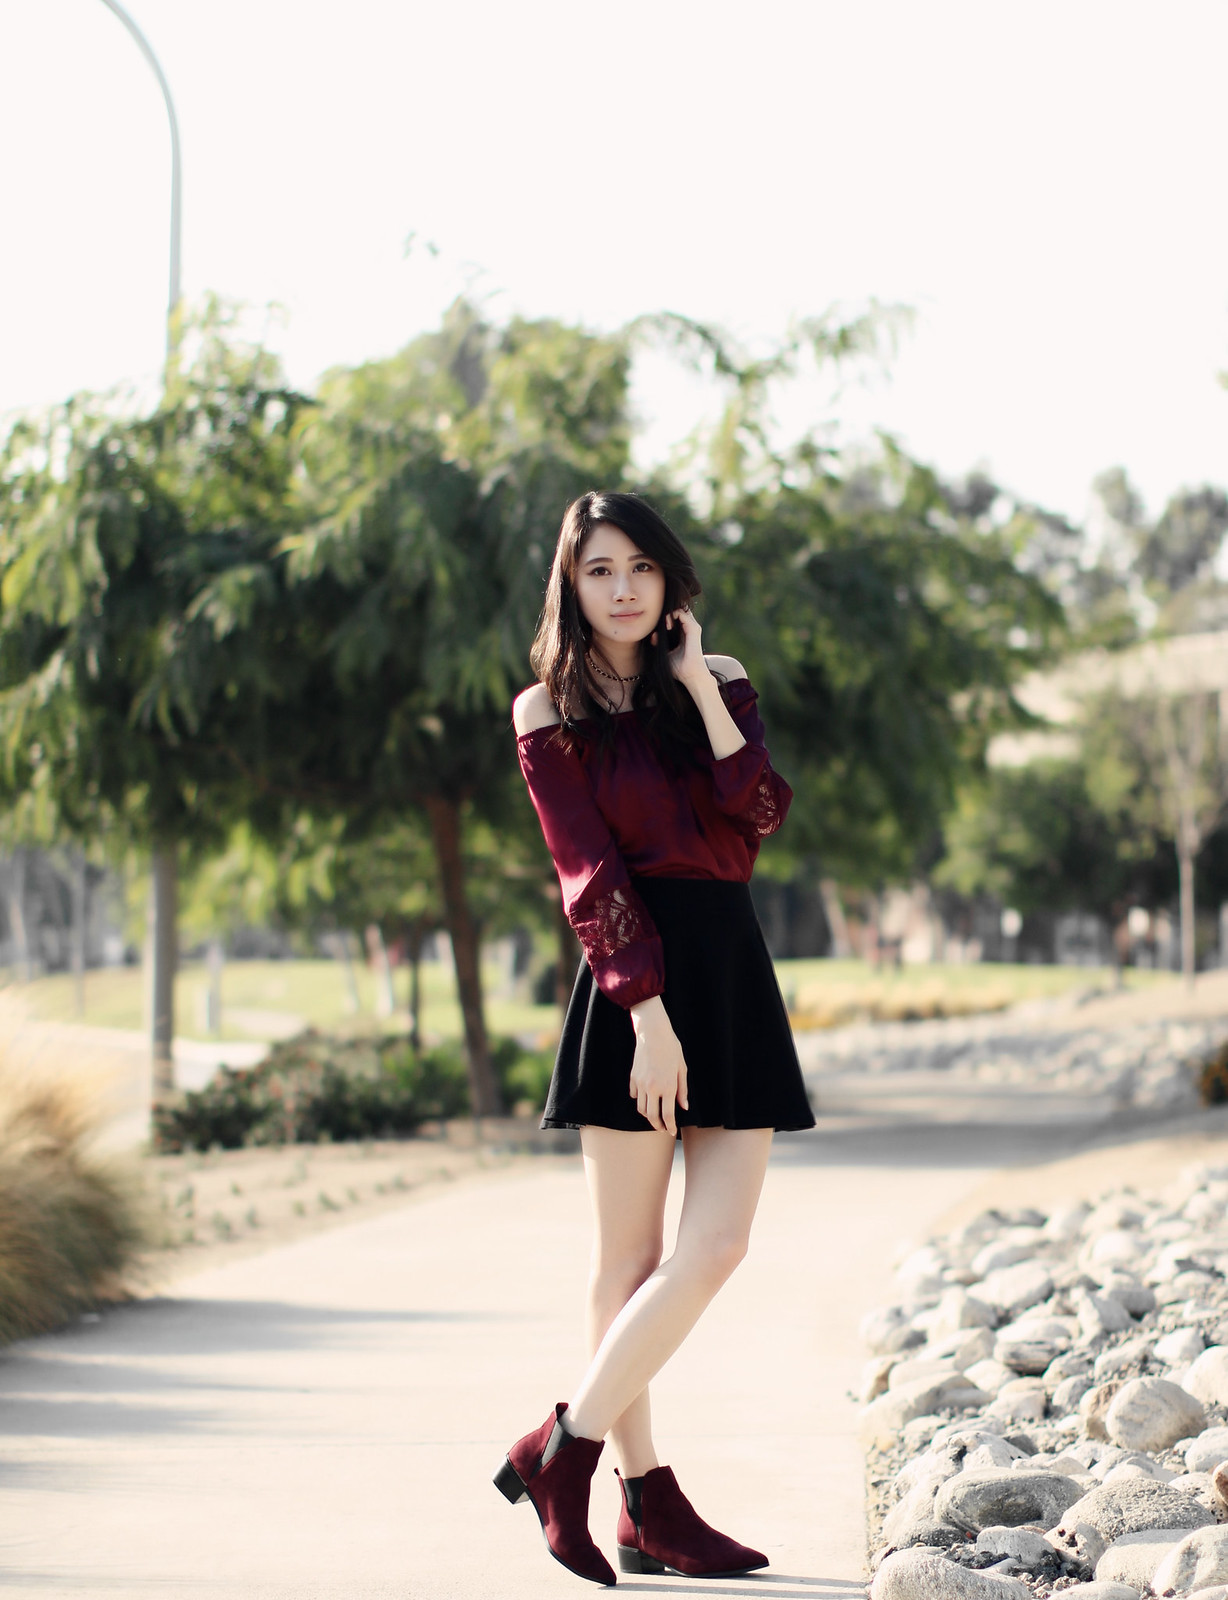 3581-ootd-fashion-style-outfitoftheday-wiwt-silk-lace-fallfashion-forever21-f21xme-elizabeeetht-clothestoyouuu